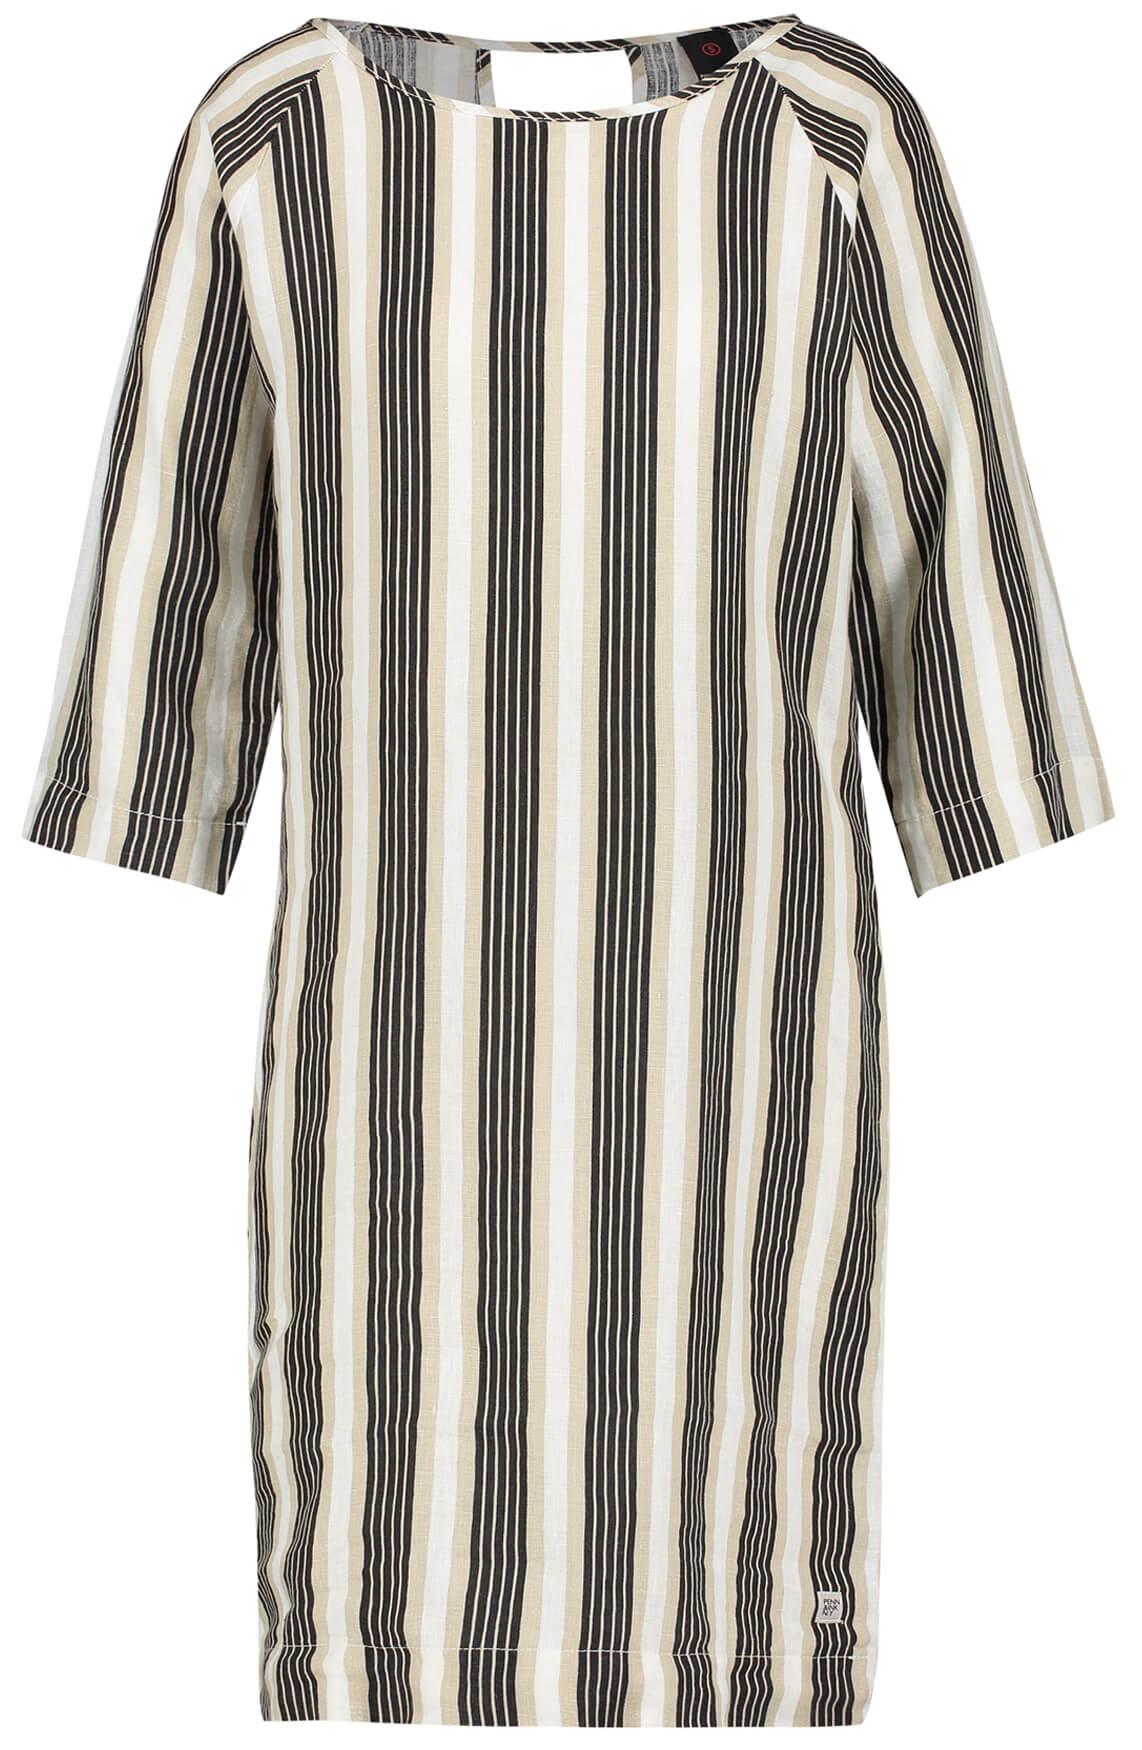 Penn & Ink Dames Gestreepte linnen jurk Bruin